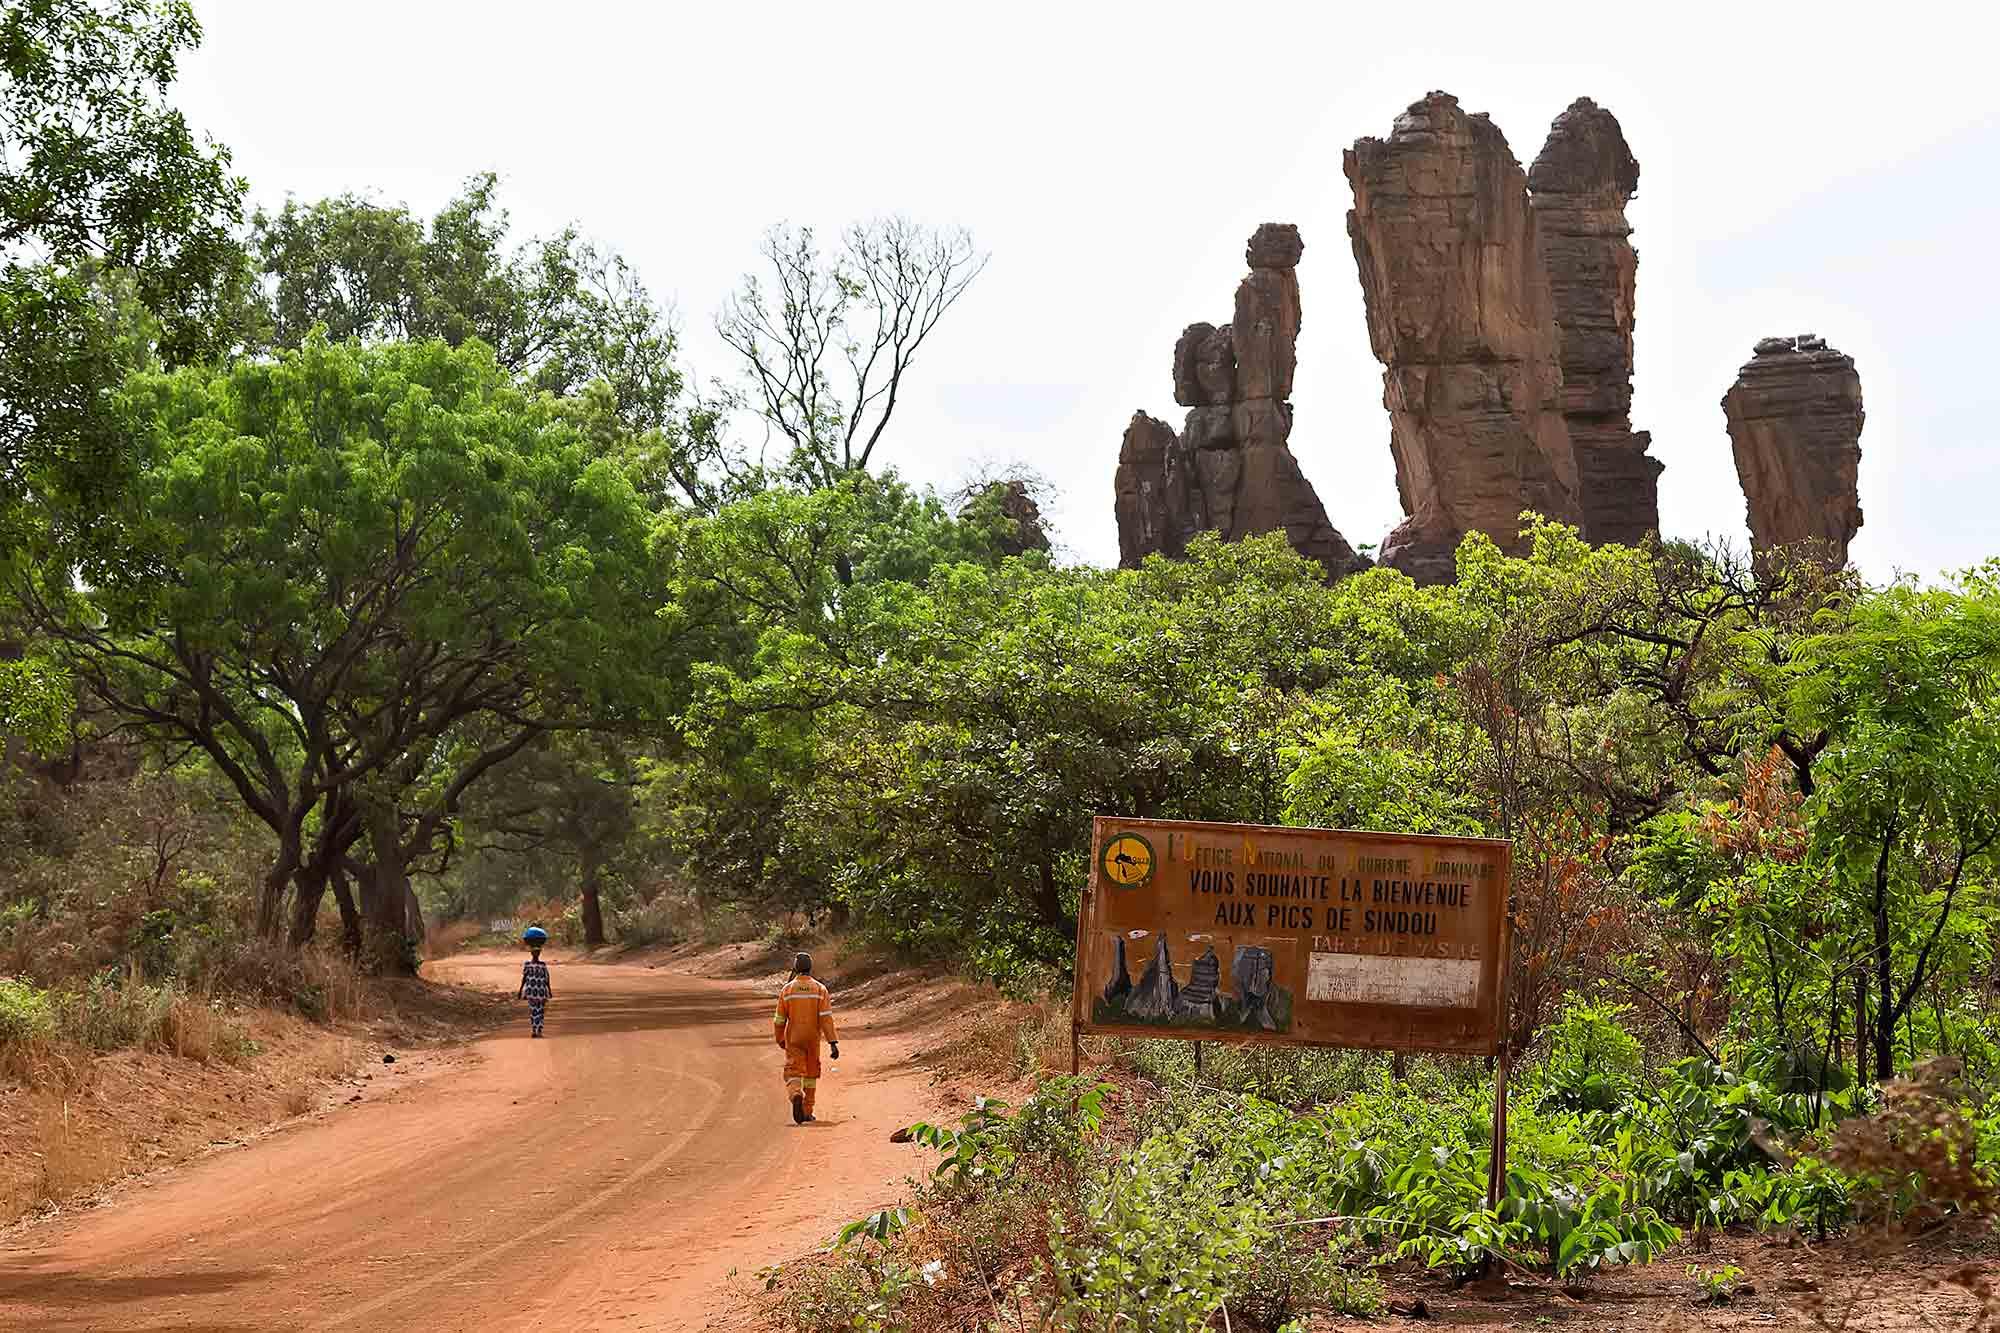 national-park-banfora-burkina-faso-africa